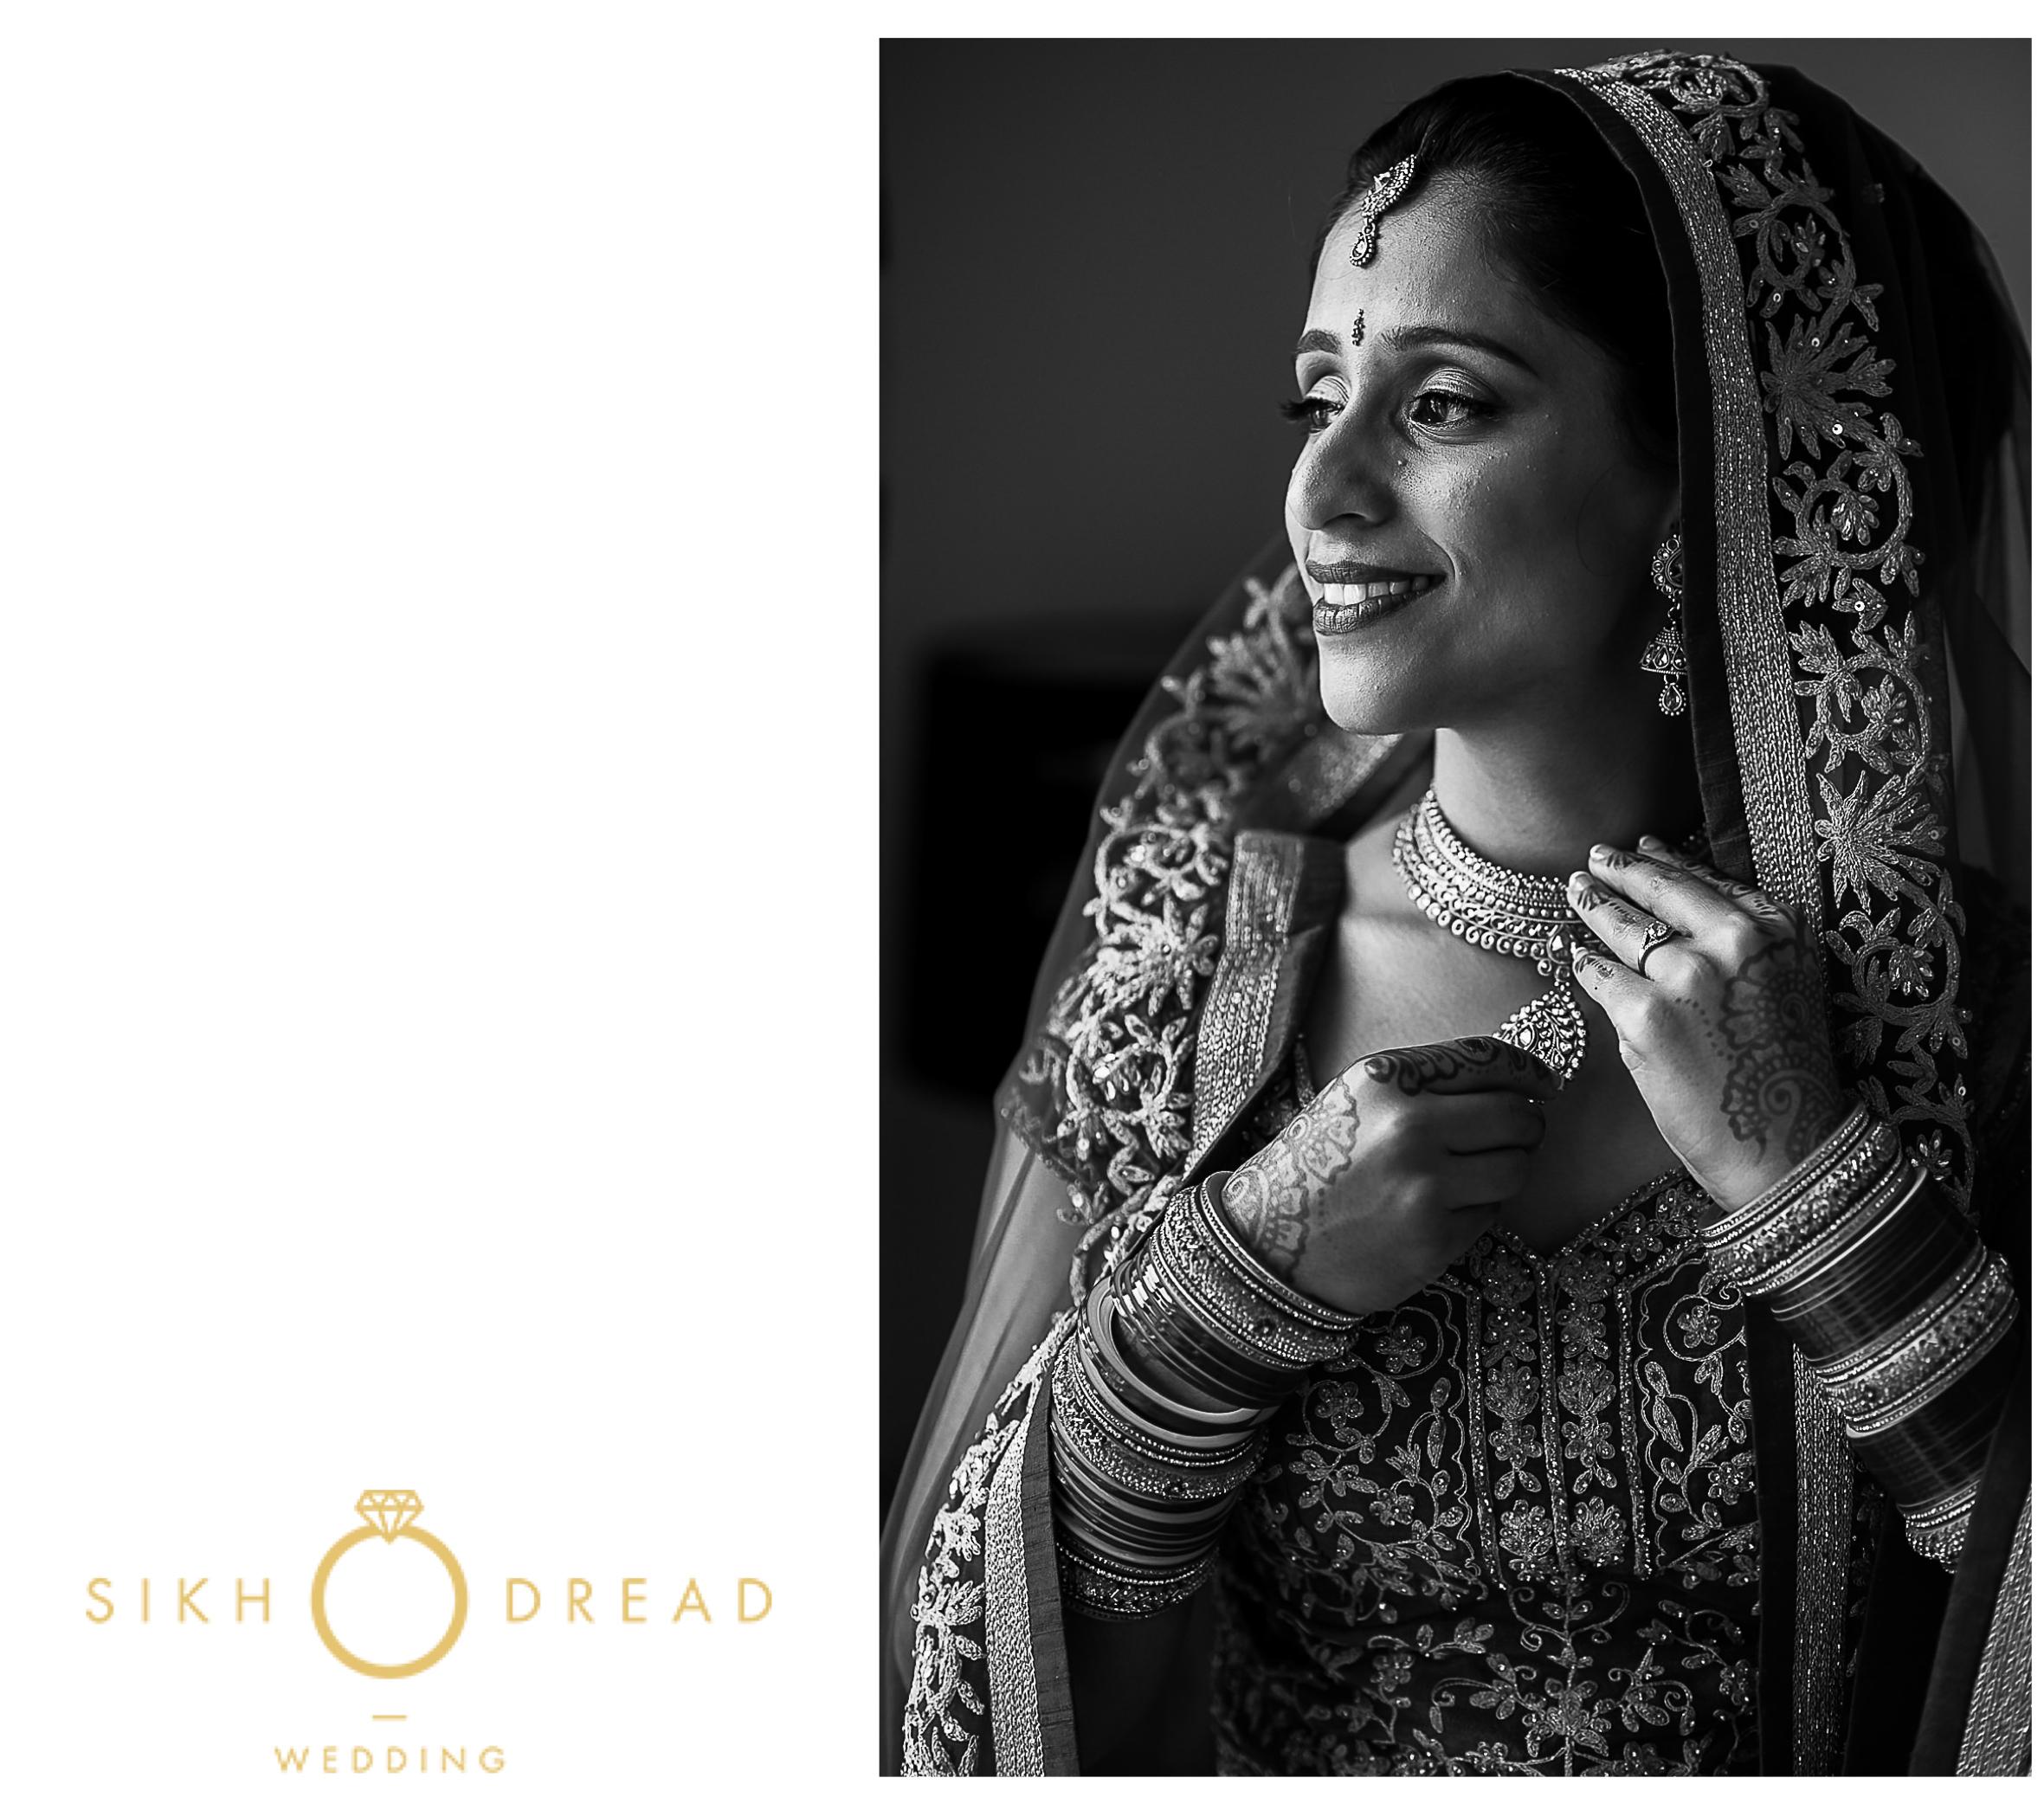 Asian Wedding Photographers SikhandDread - 107